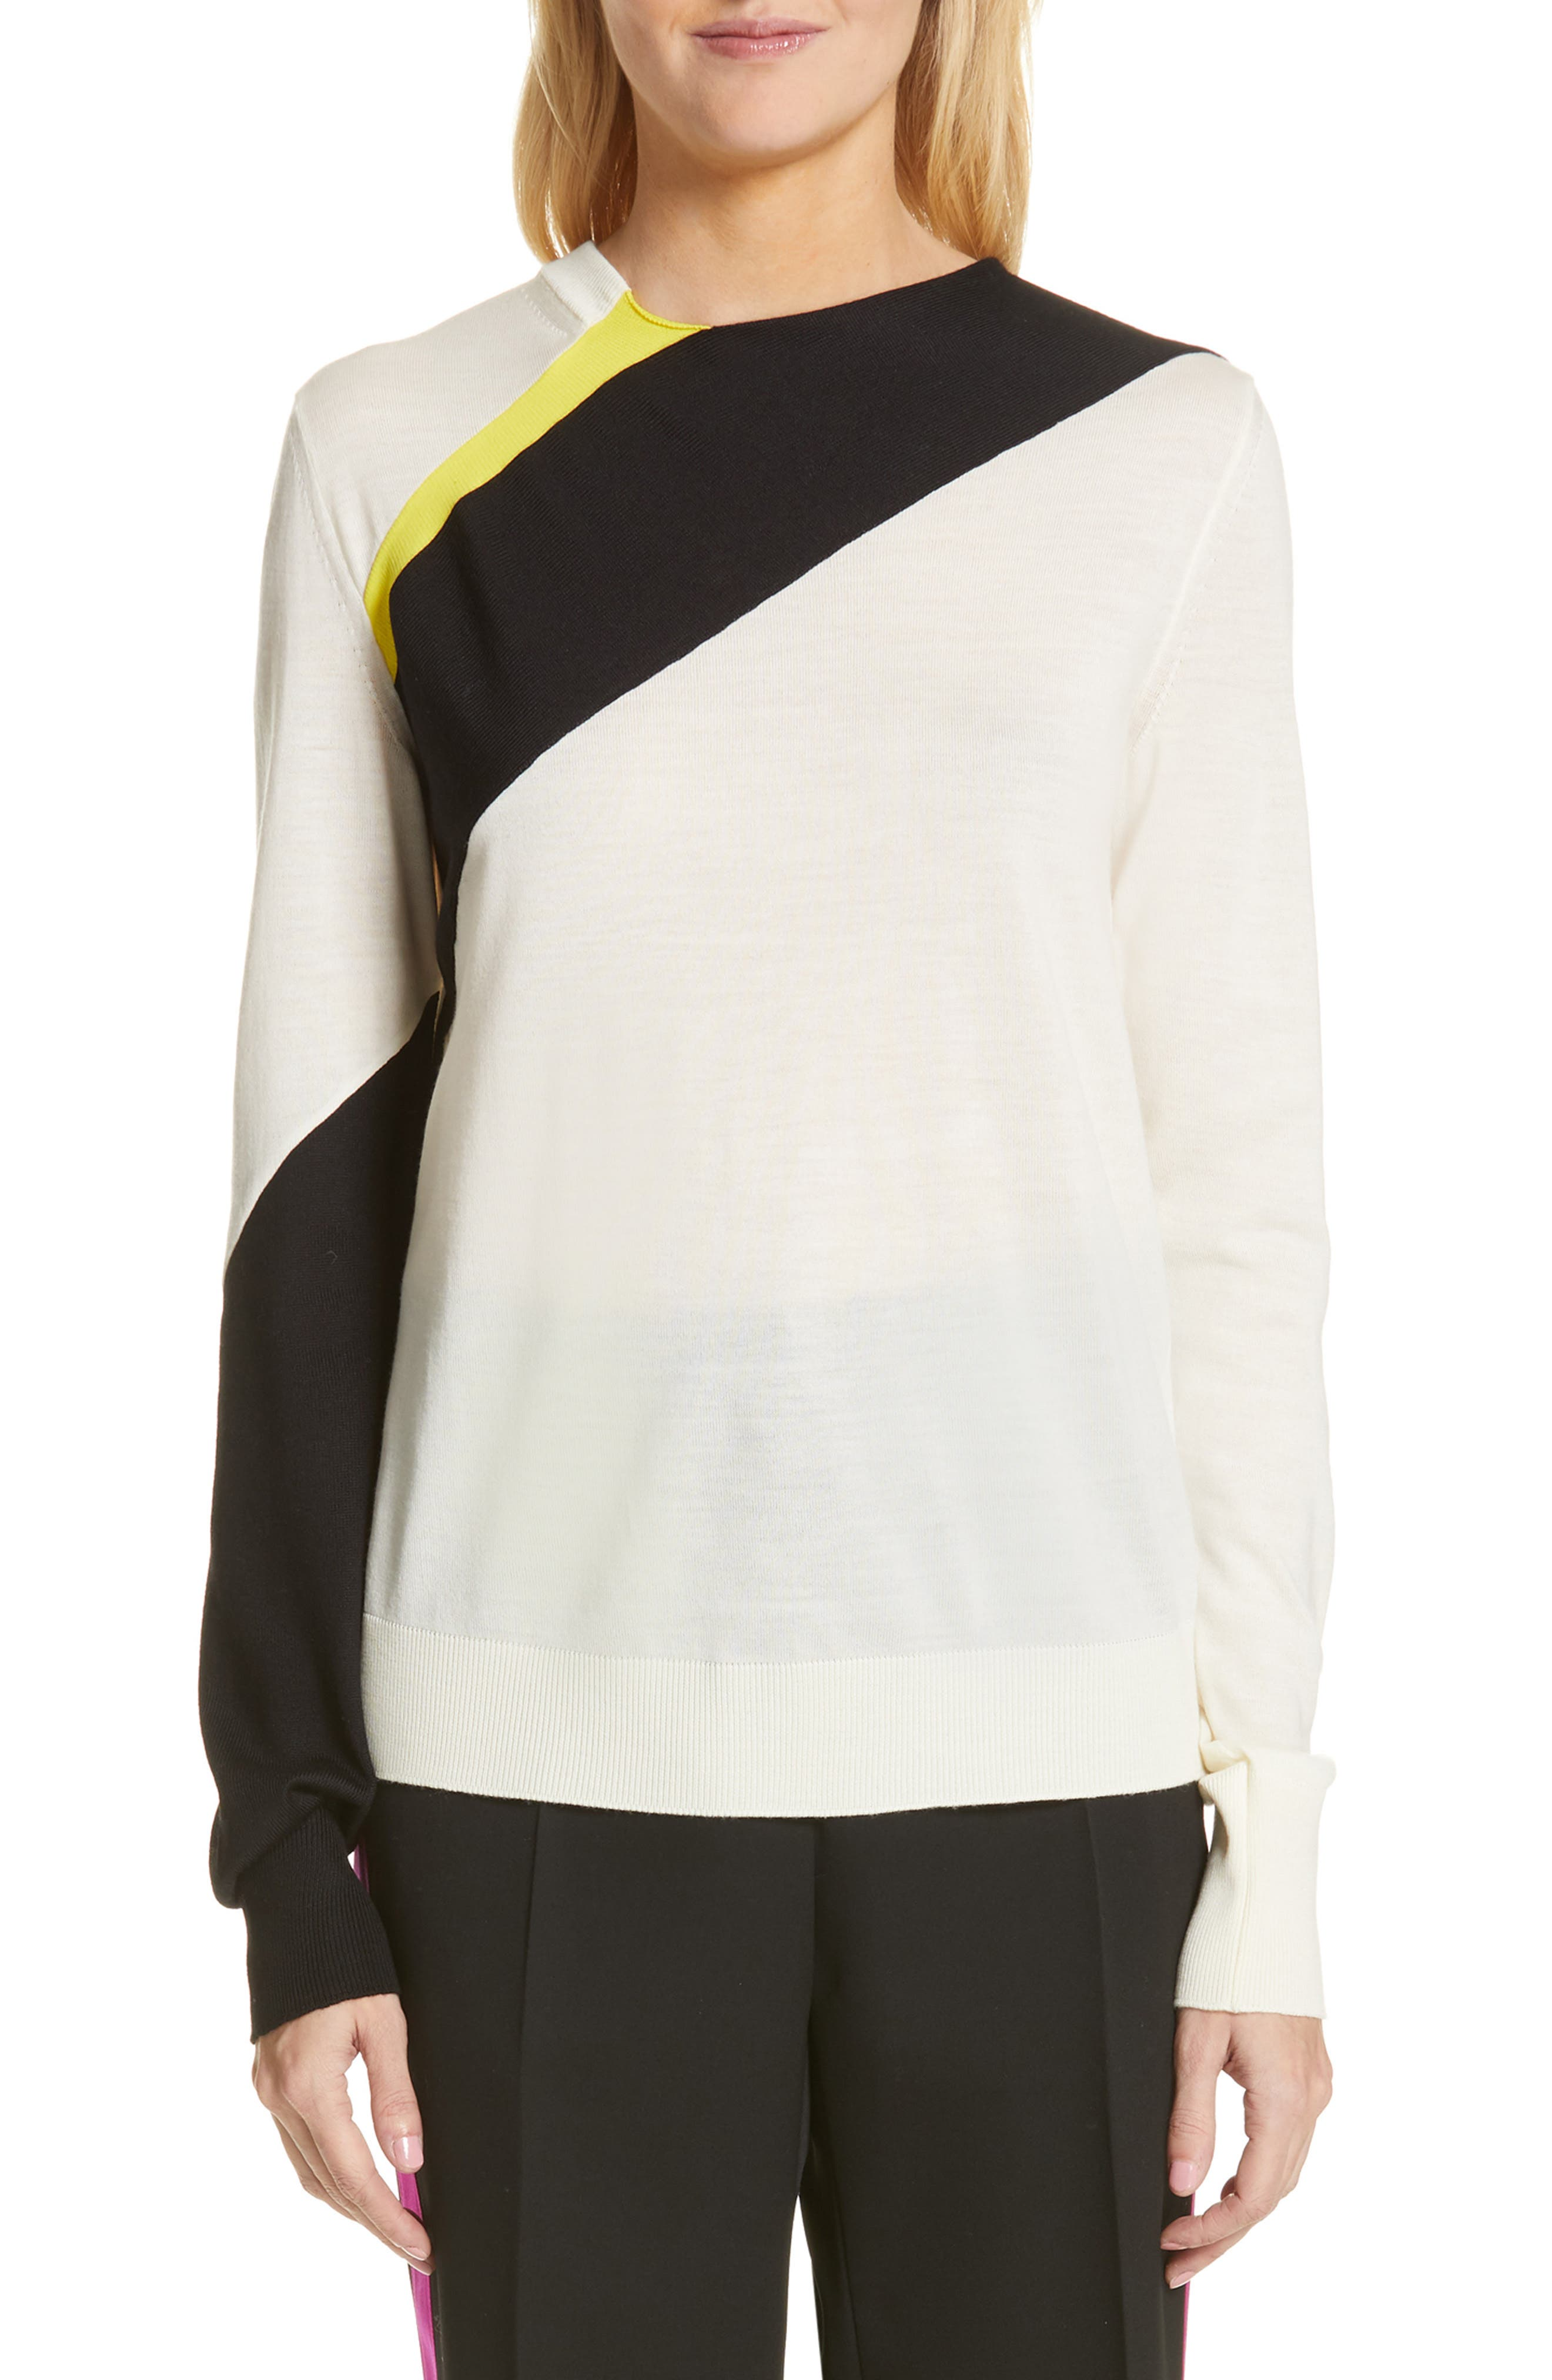 CALVIN KLEIN 205W39NYC Contrast Stripe Wool Blend Sweater, Main, color, WHITE BLACK TOURNESOL